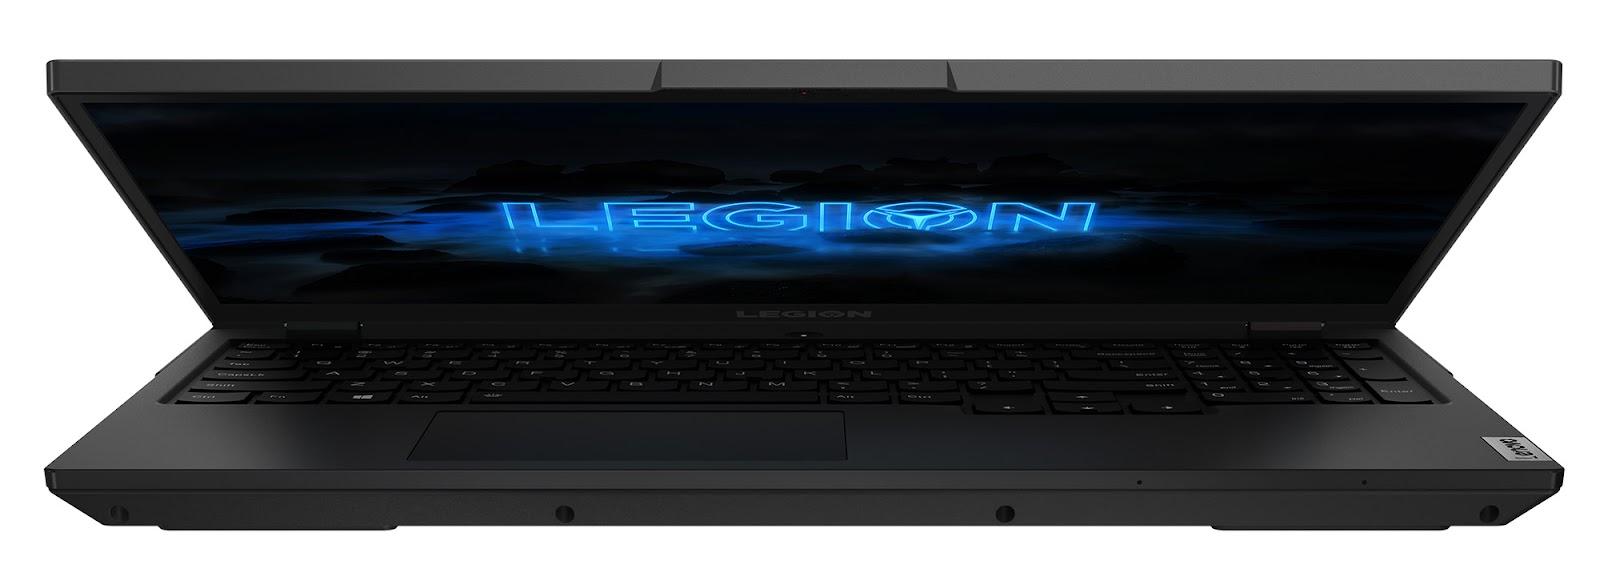 Фото 1. Ноутбук Lenovo Legion 5 15IMH05H Phantom Black (81Y600CYRE)